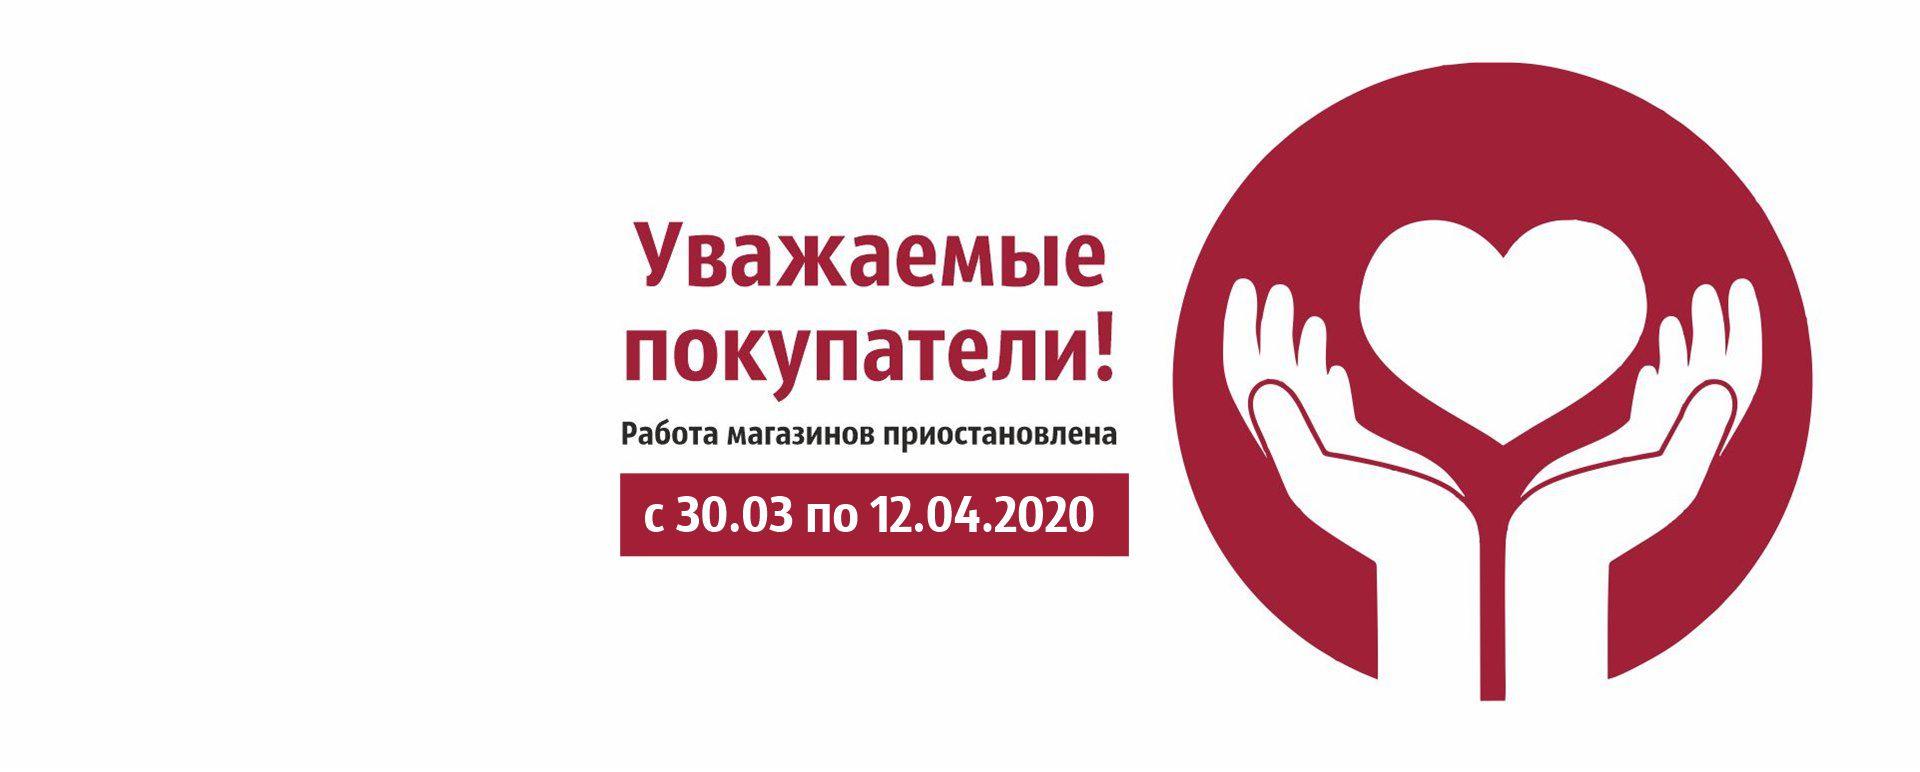 https://www.almazcom.ru/pub/img/Info/24/almaz_karantin_12.jpg